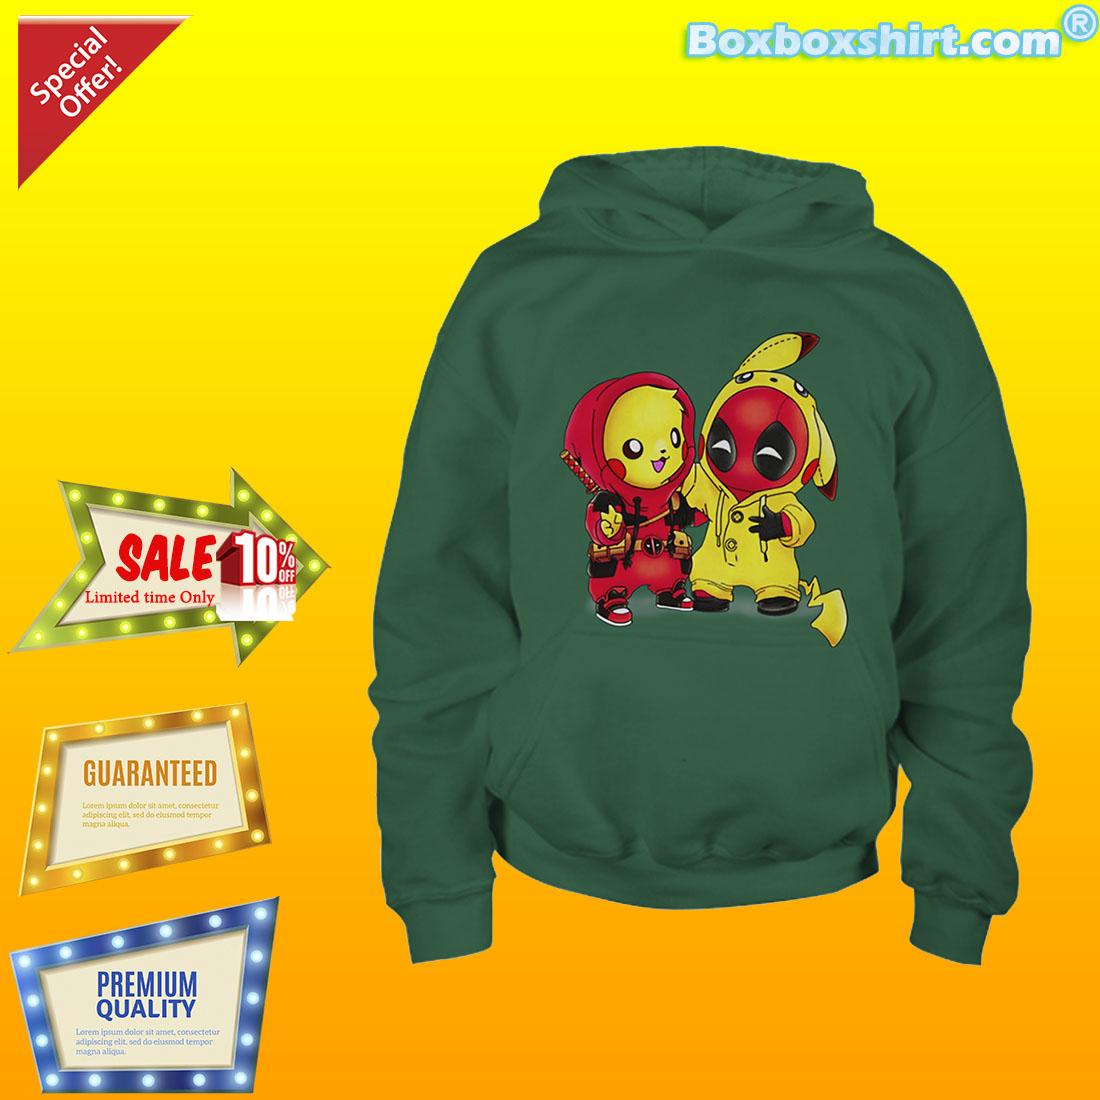 f8aa348e1 Pikachu deadpool pikapool shirt. Our partner: boxboxshirt